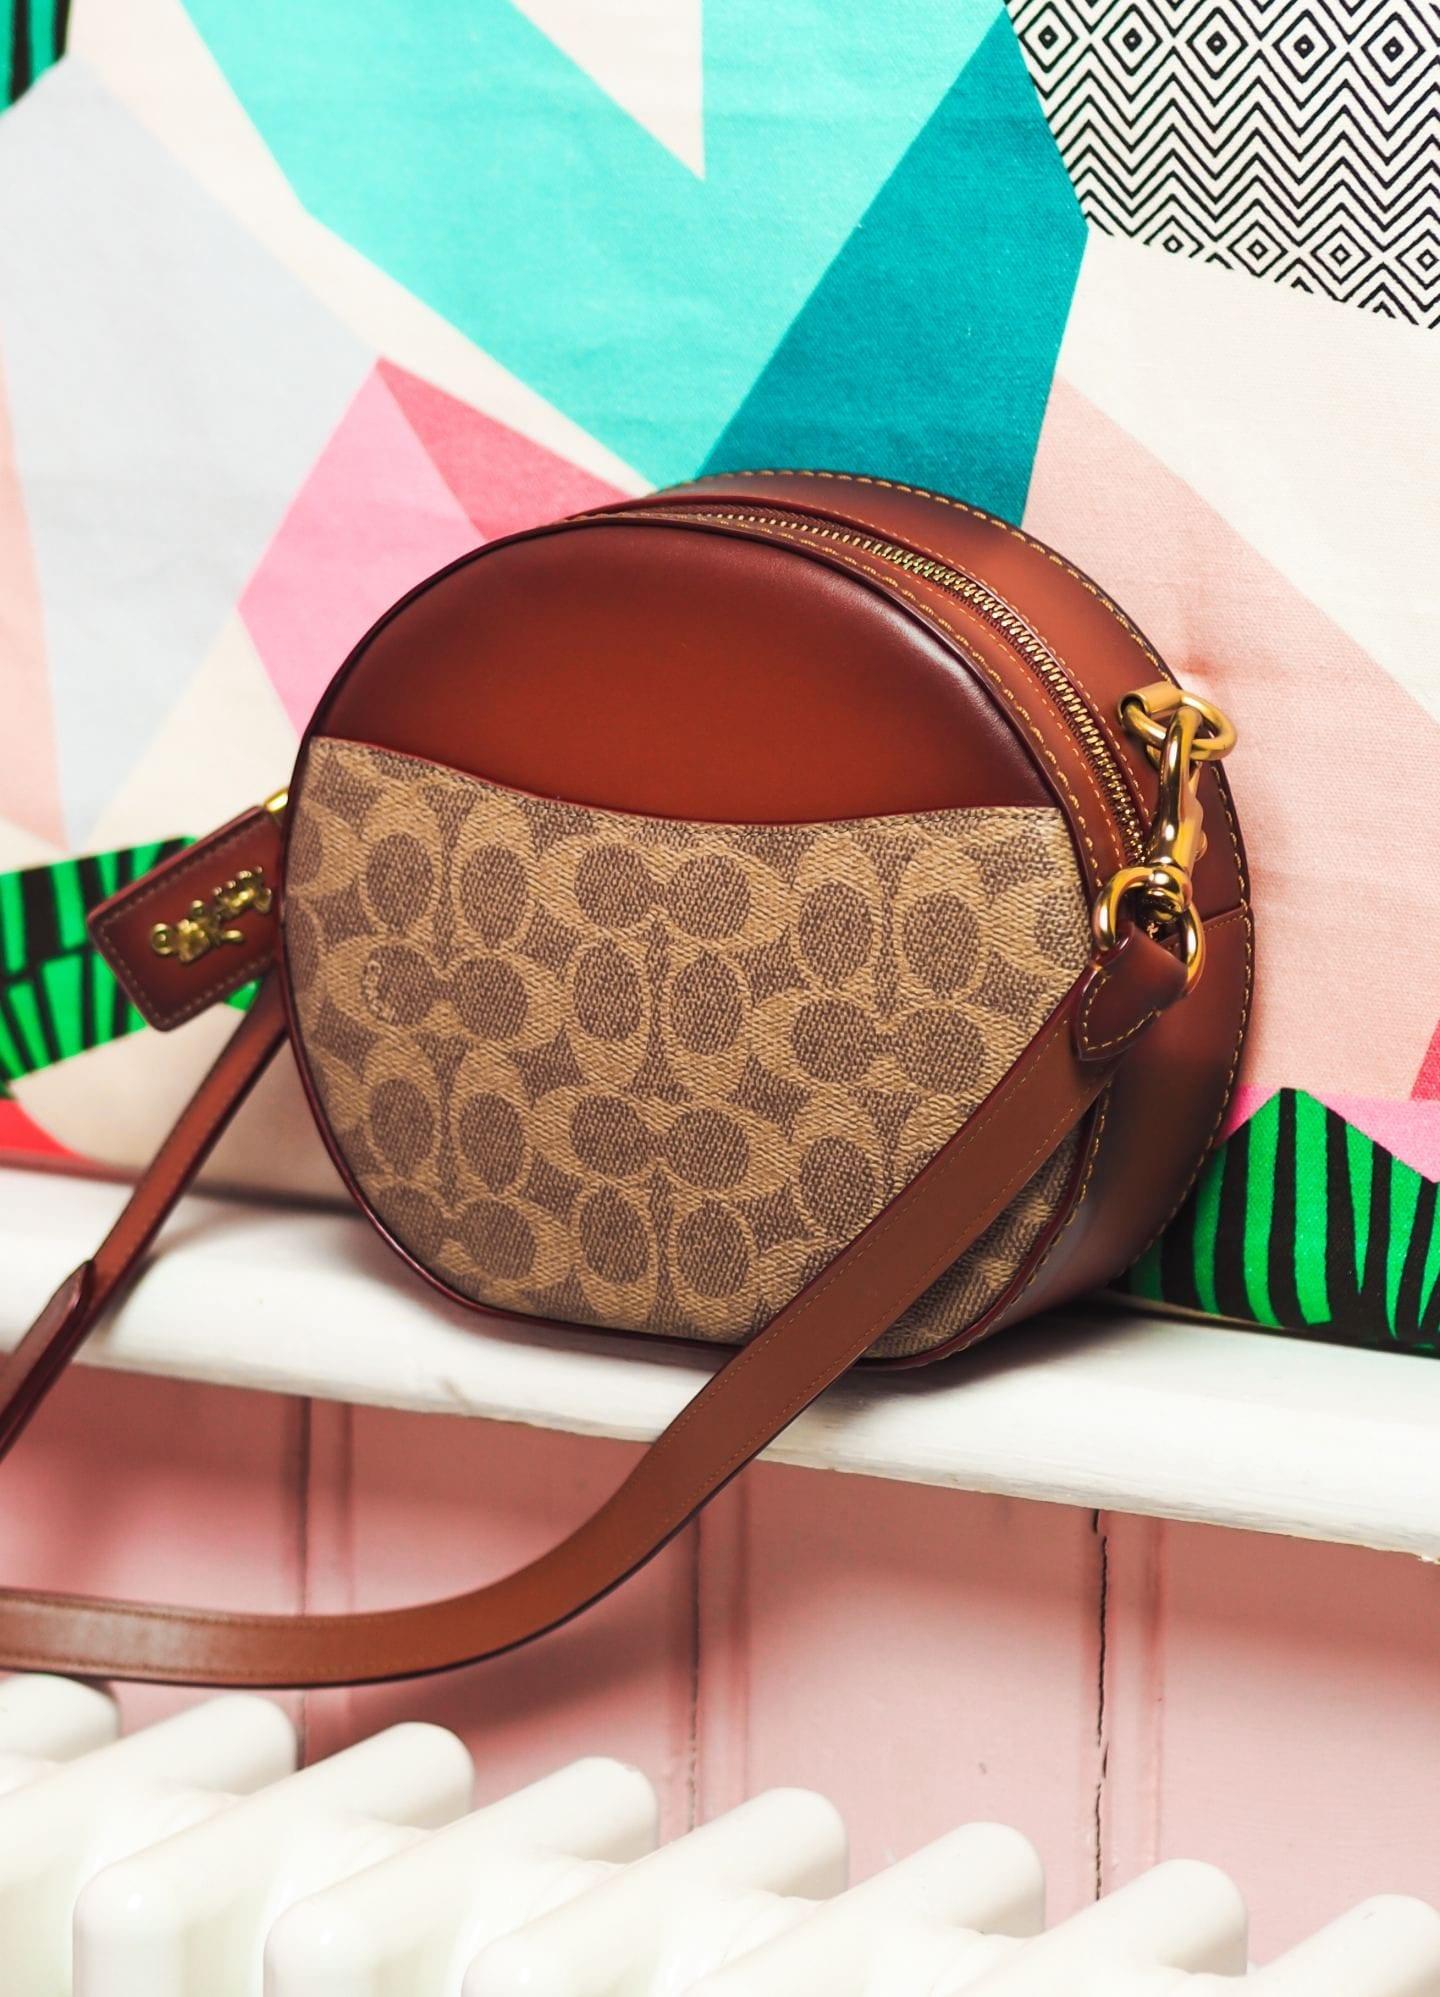 coach canteen crossbody round handbag in signature canvas bag brown leather bag review handbag luxury